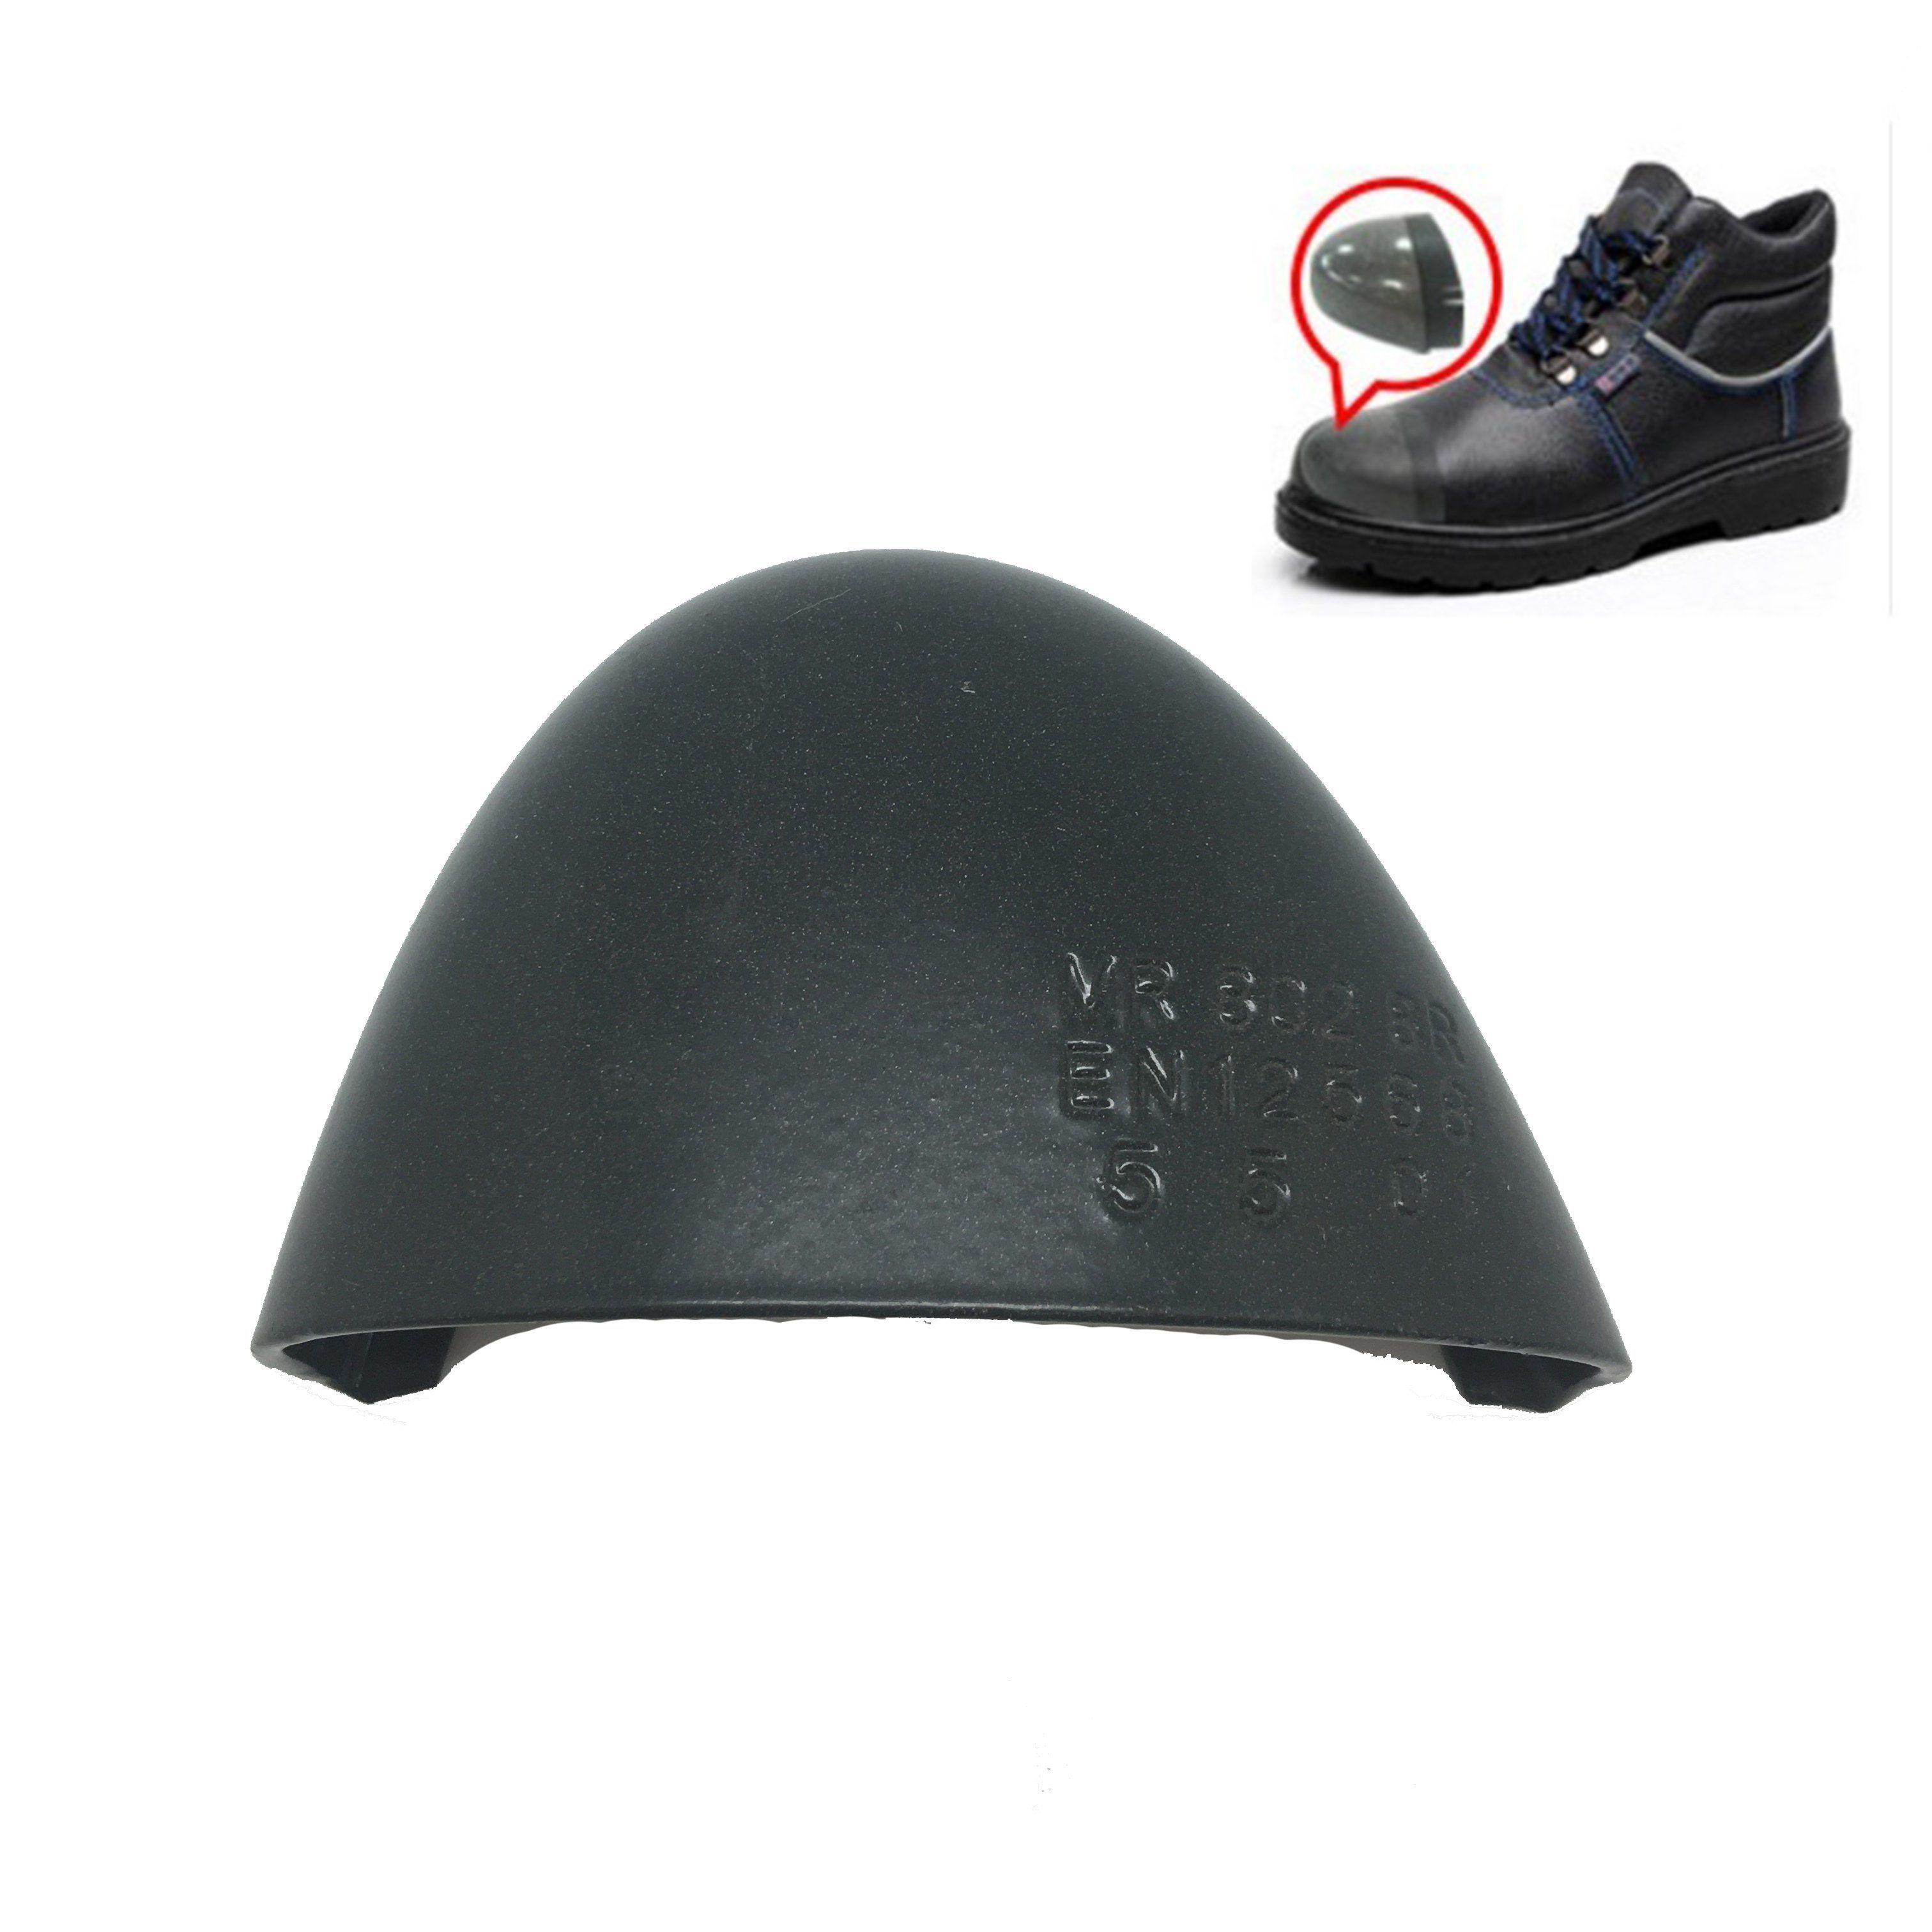 China Steel/Fiberglass/Plastic Toe Cap